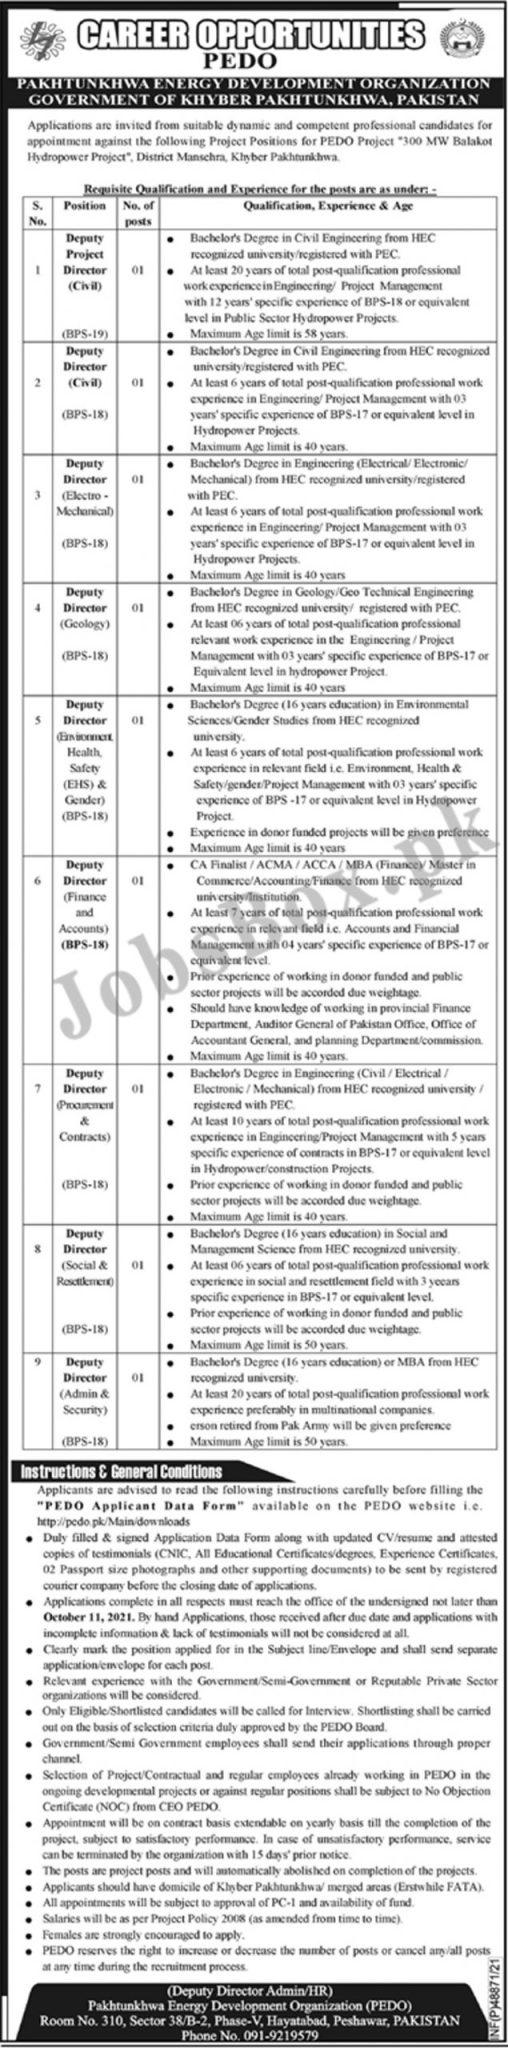 https://www.pedo.pk/Main/downloads - PEDO Pakhtunkhwa Energy Development Organization Jobs 2021 in Pakistan